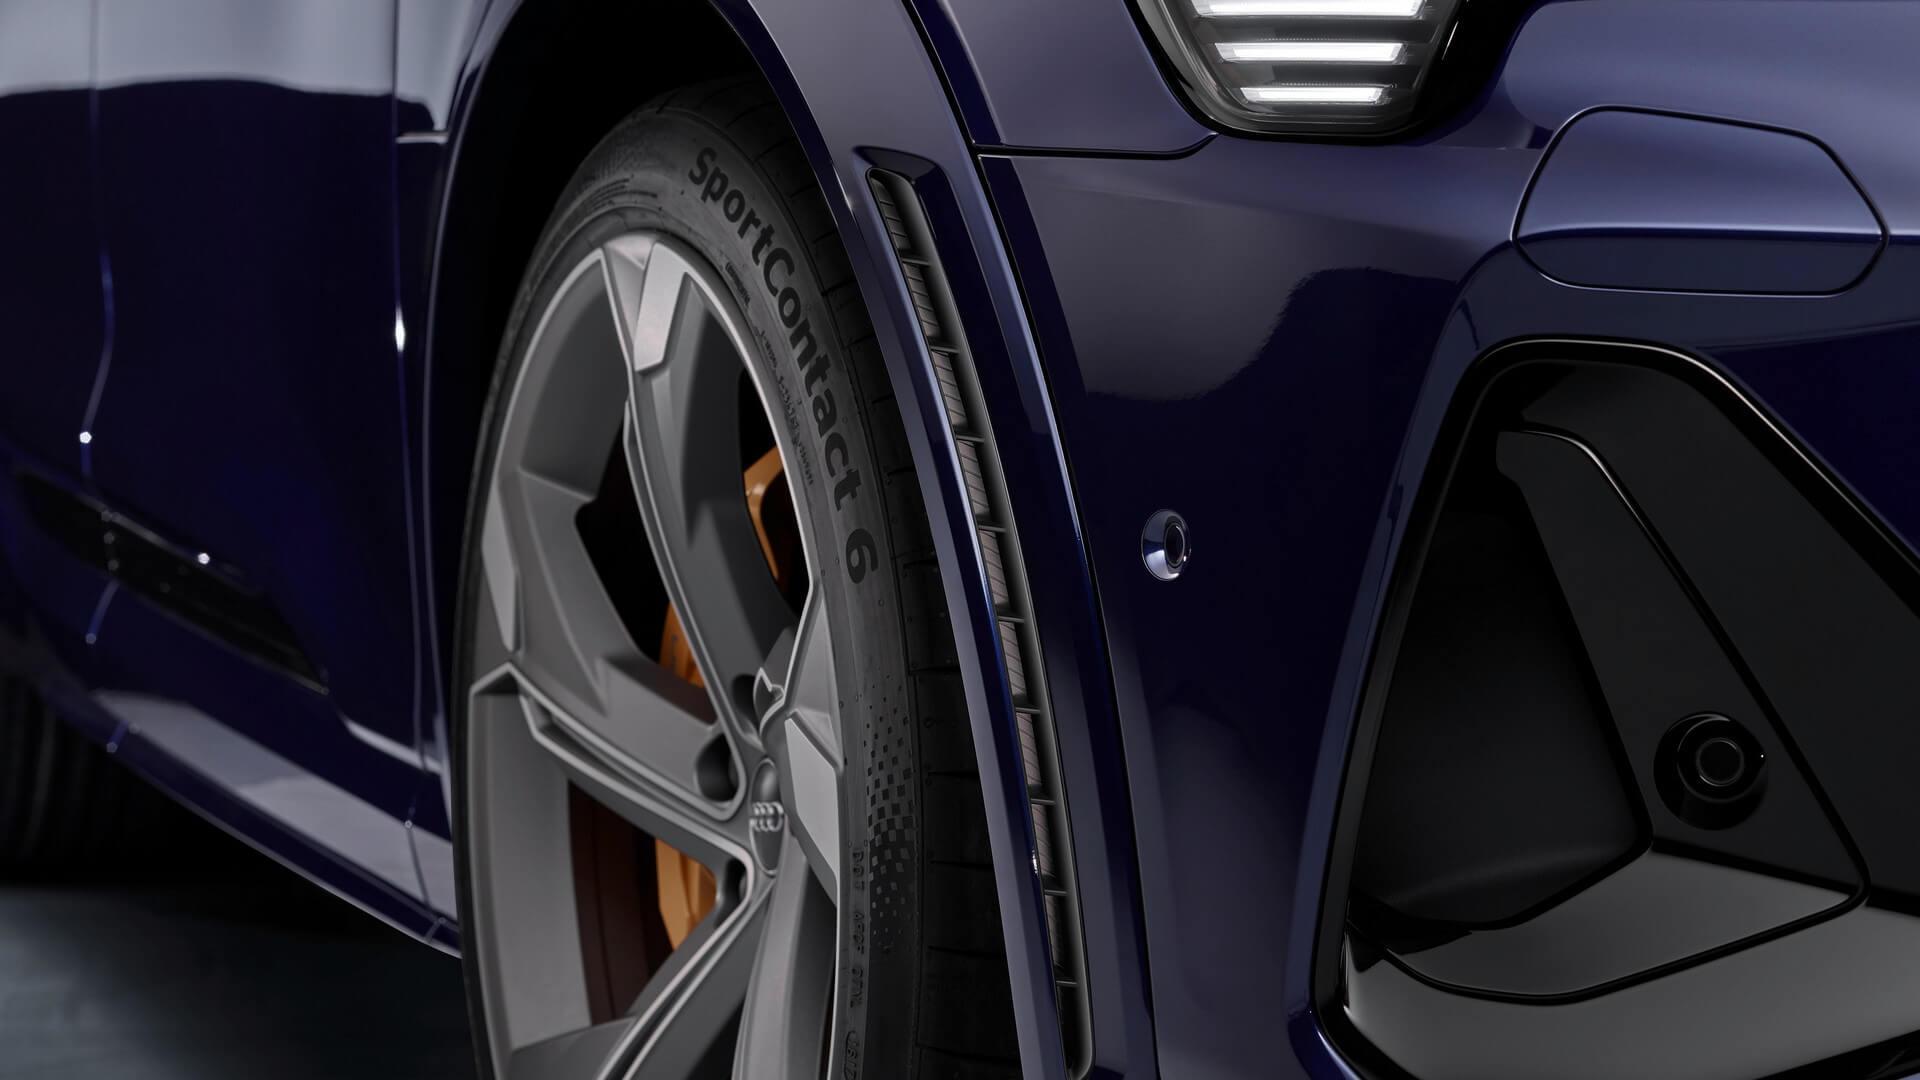 Audi-E-Tron-S-and-E-Tron-S-Sportback-2020-117